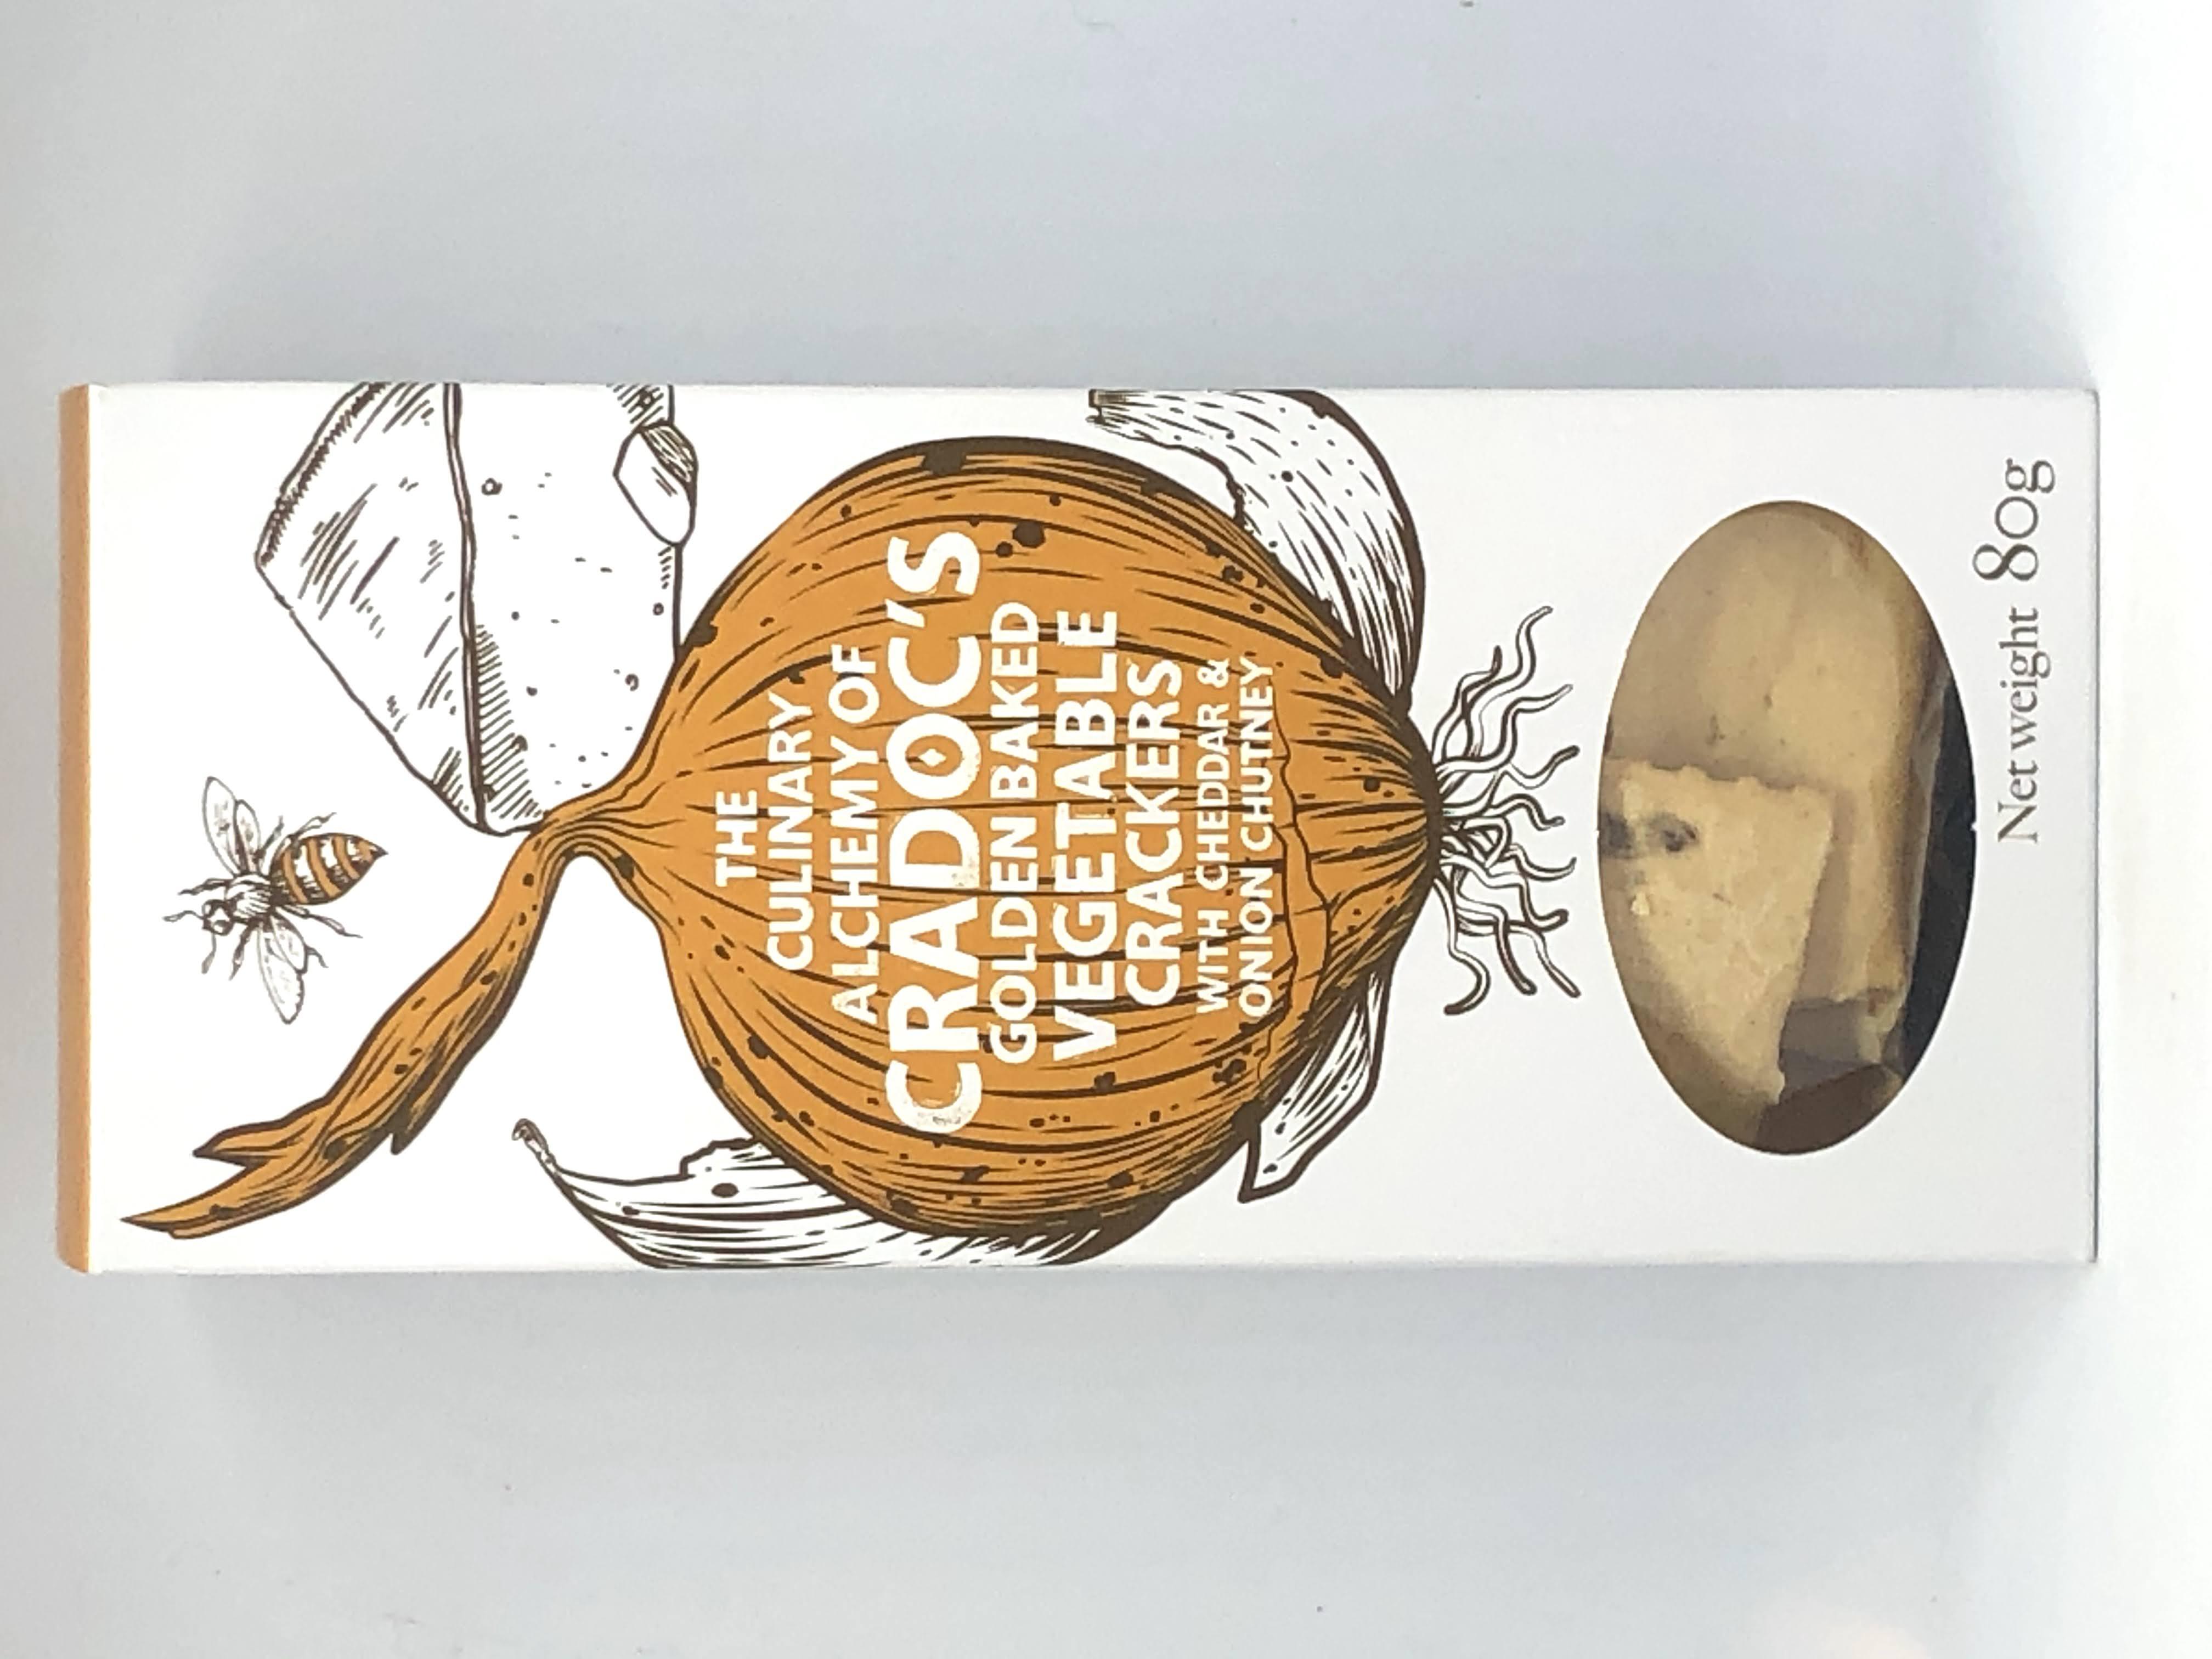 Cradoc's Crackers